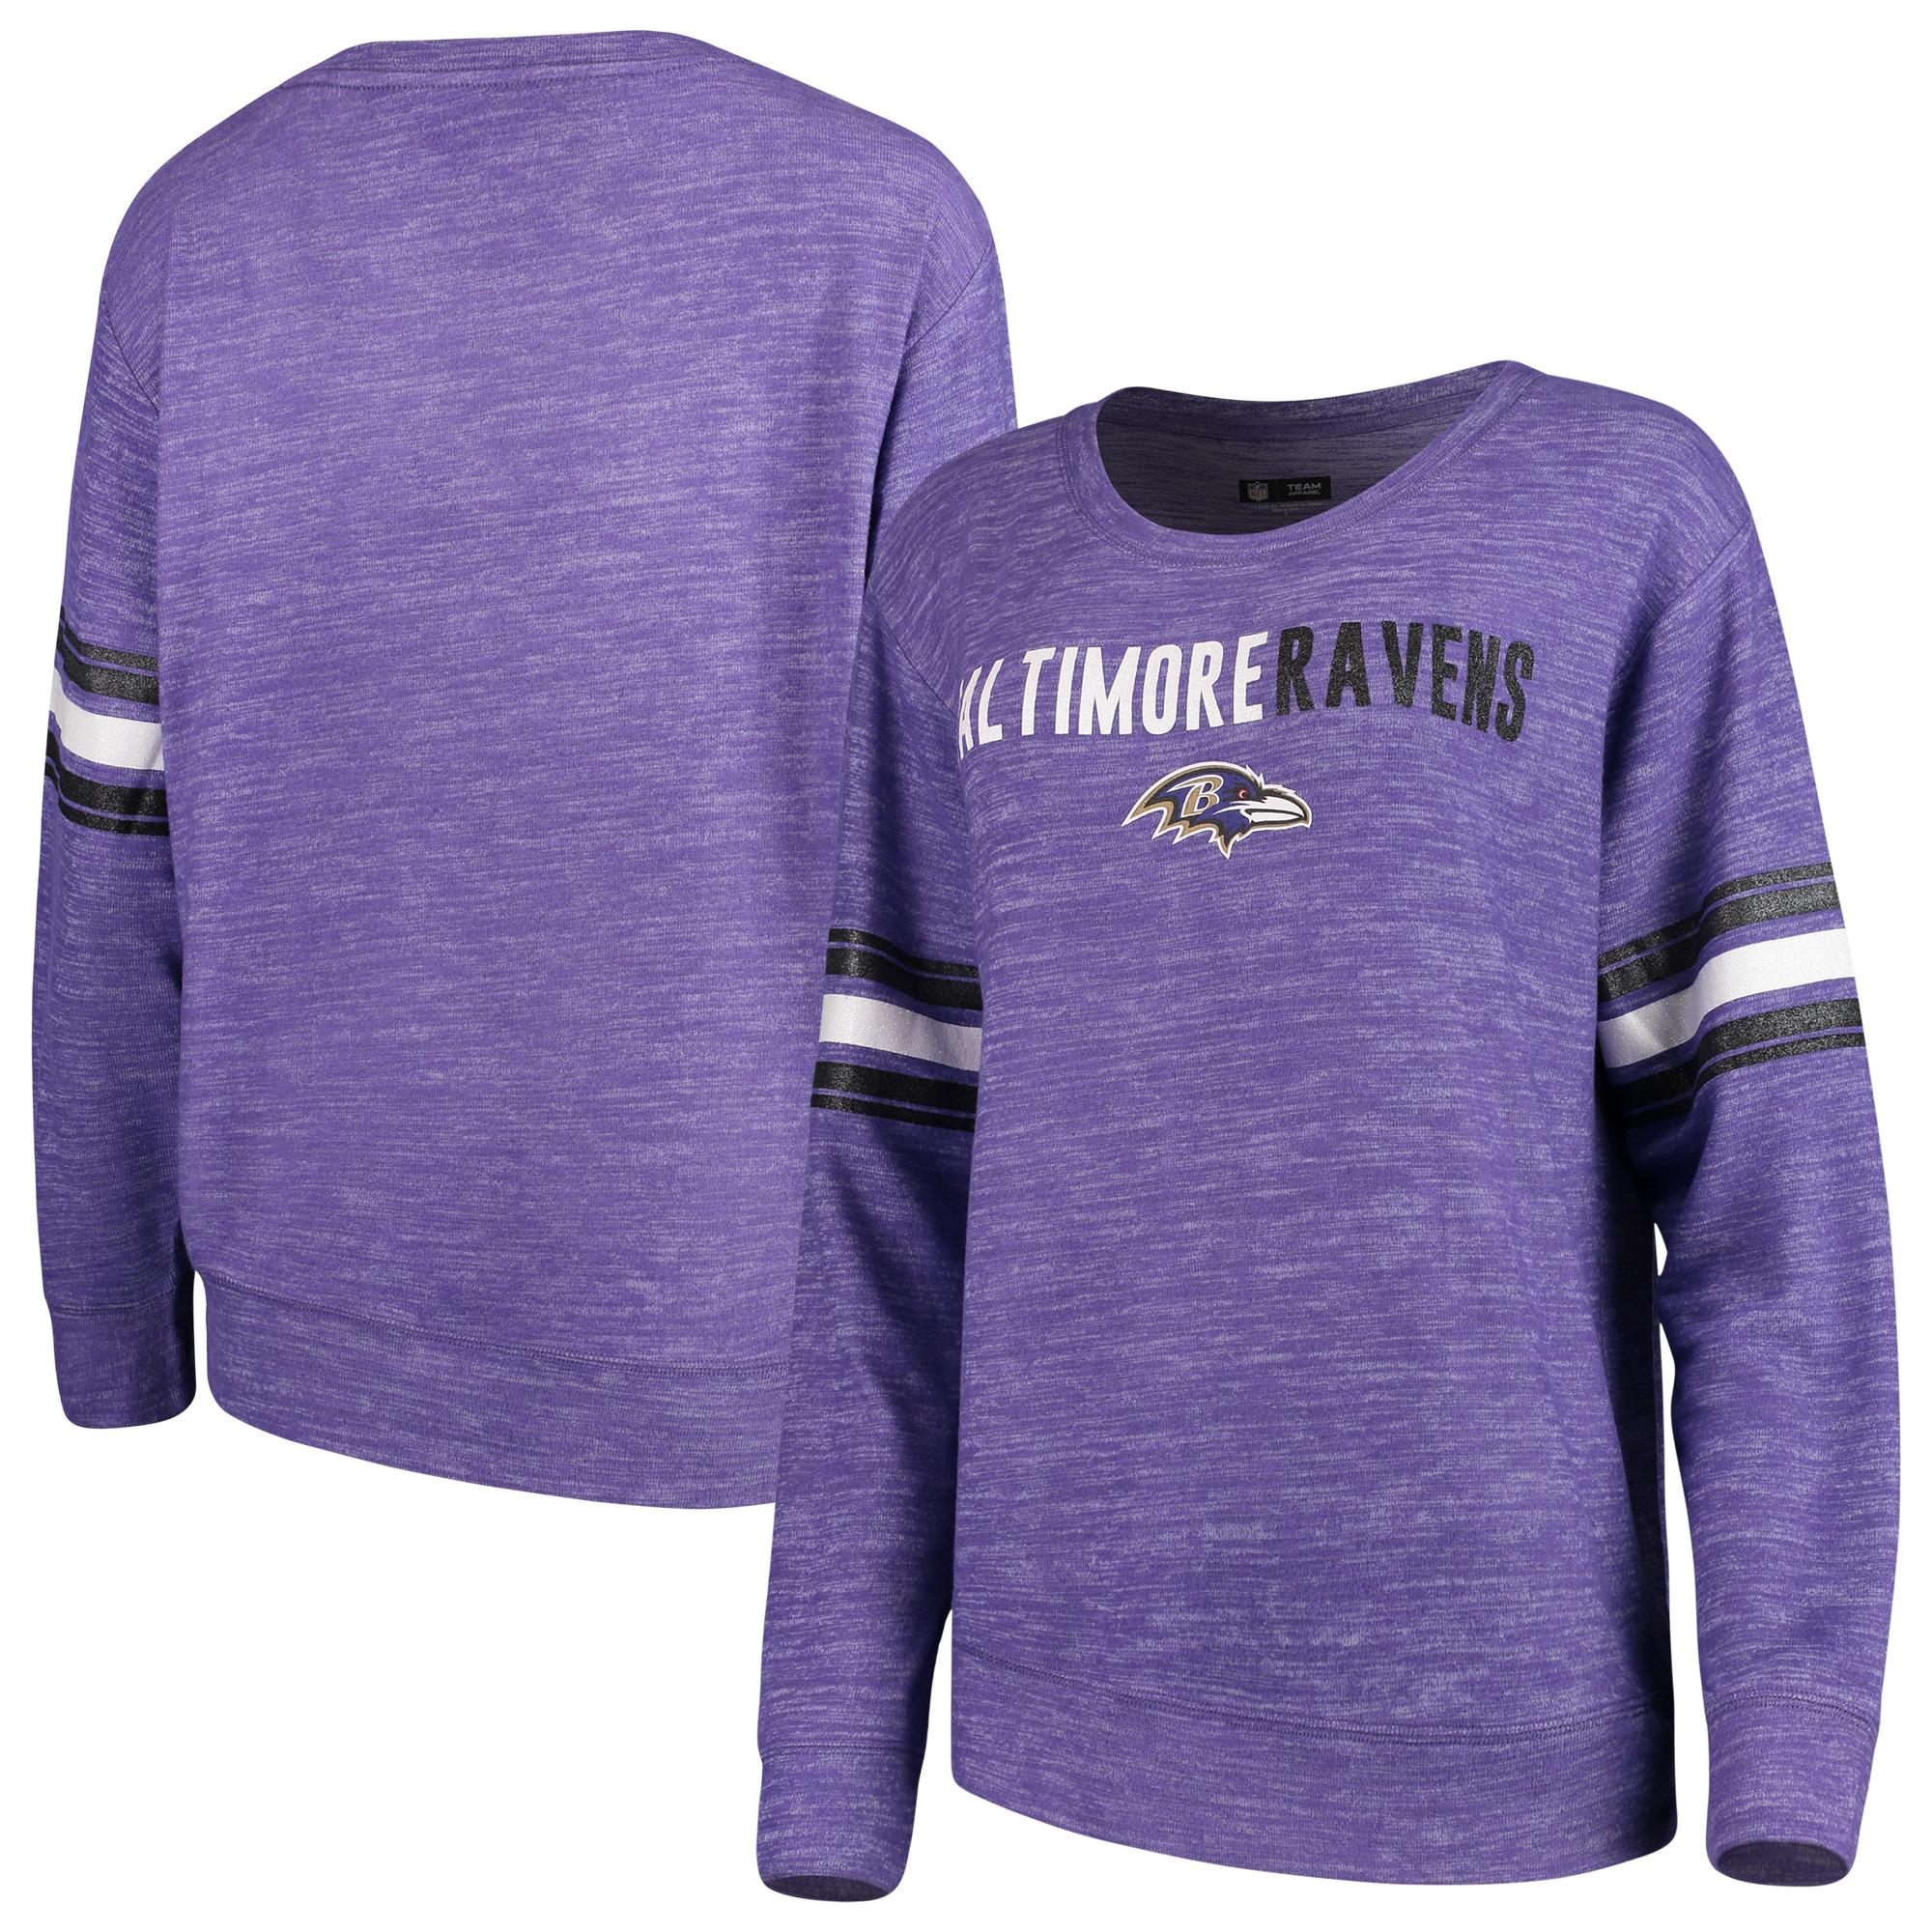 Baltimore Ravens New Era Women's Glitter Space Dye Crew Neck Tri-Blend Sweatshirt - Purple